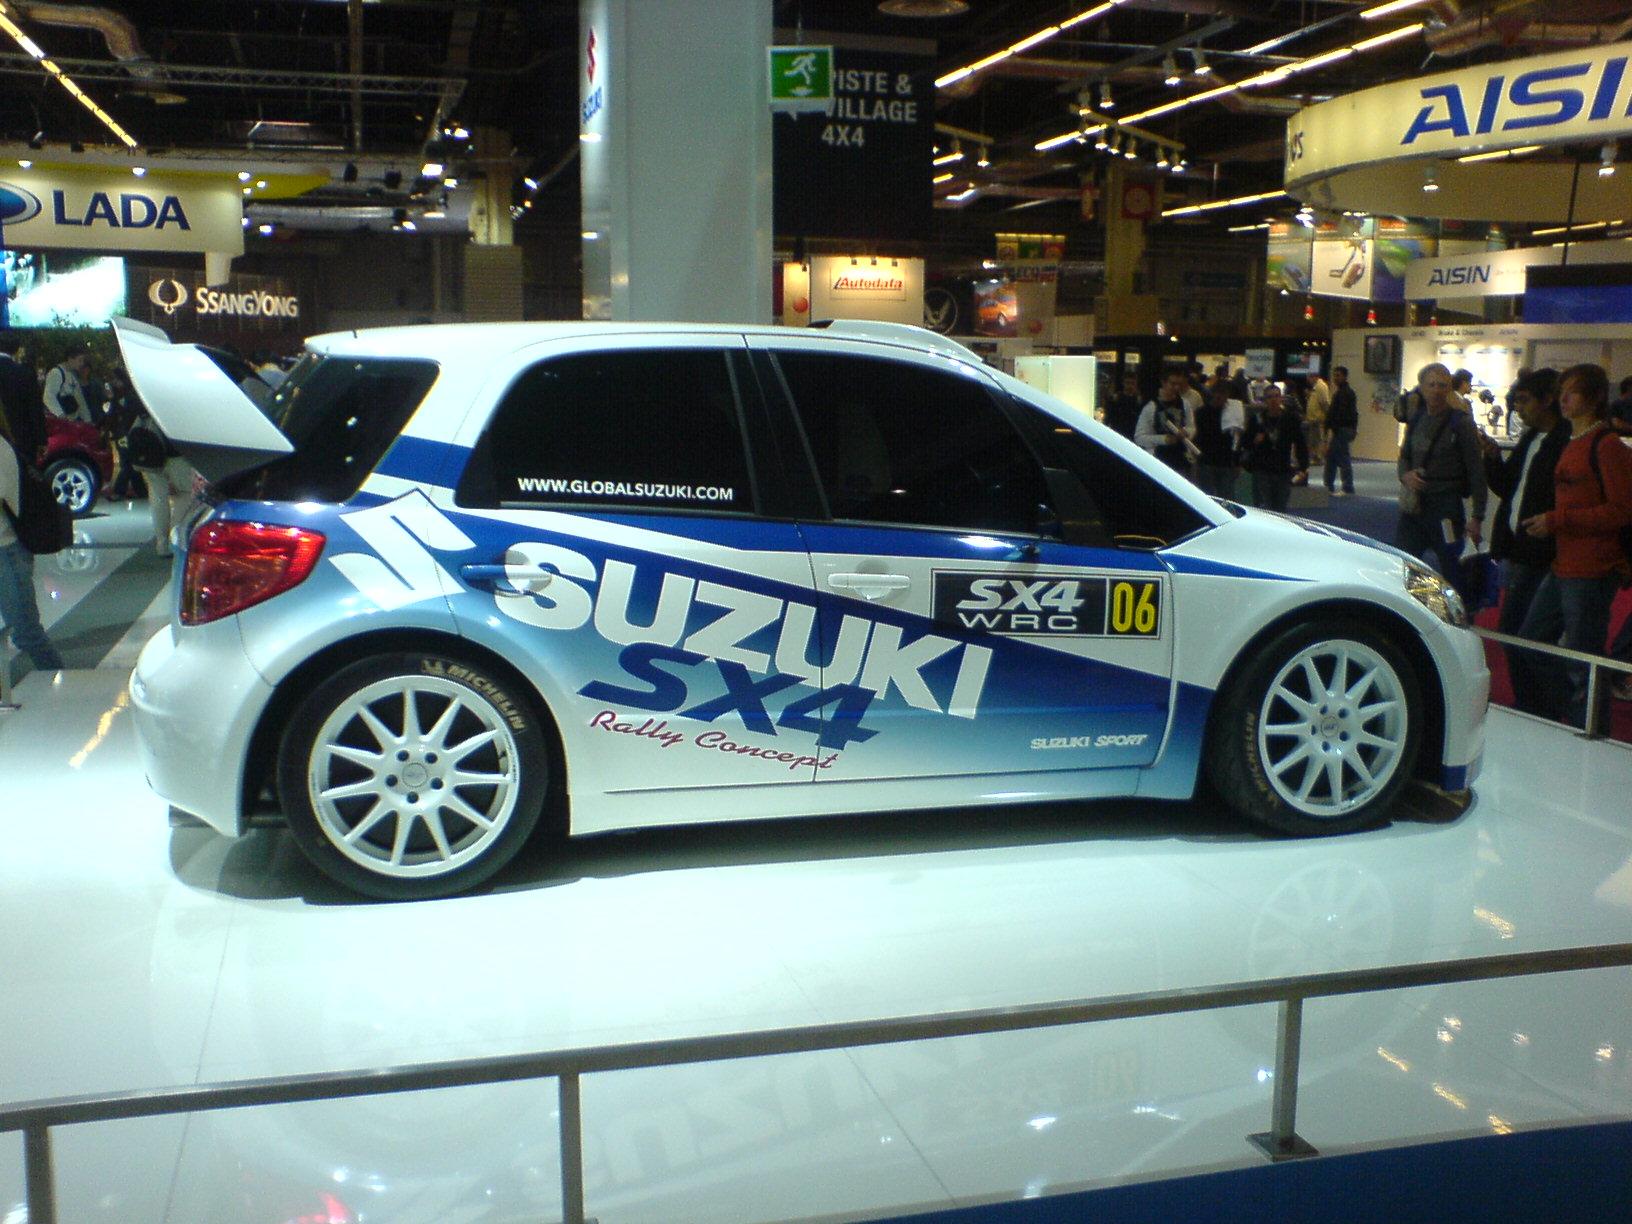 Lifted Suzuki Aerio